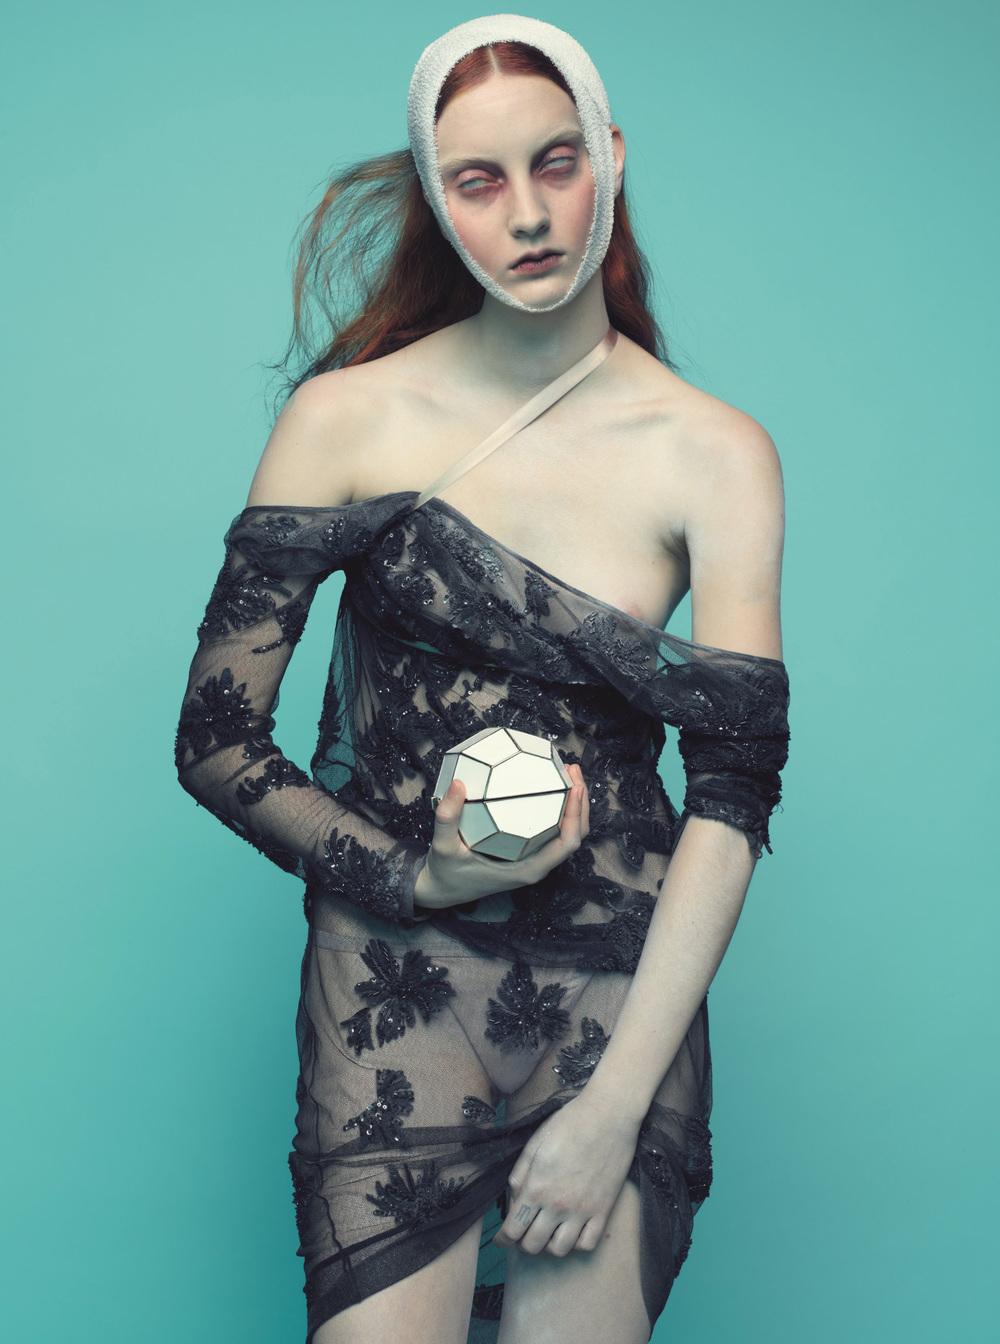 Codie_Young-Nicolas_Valois-The_Wild_Magazine-10-mode.newslicious.jpg